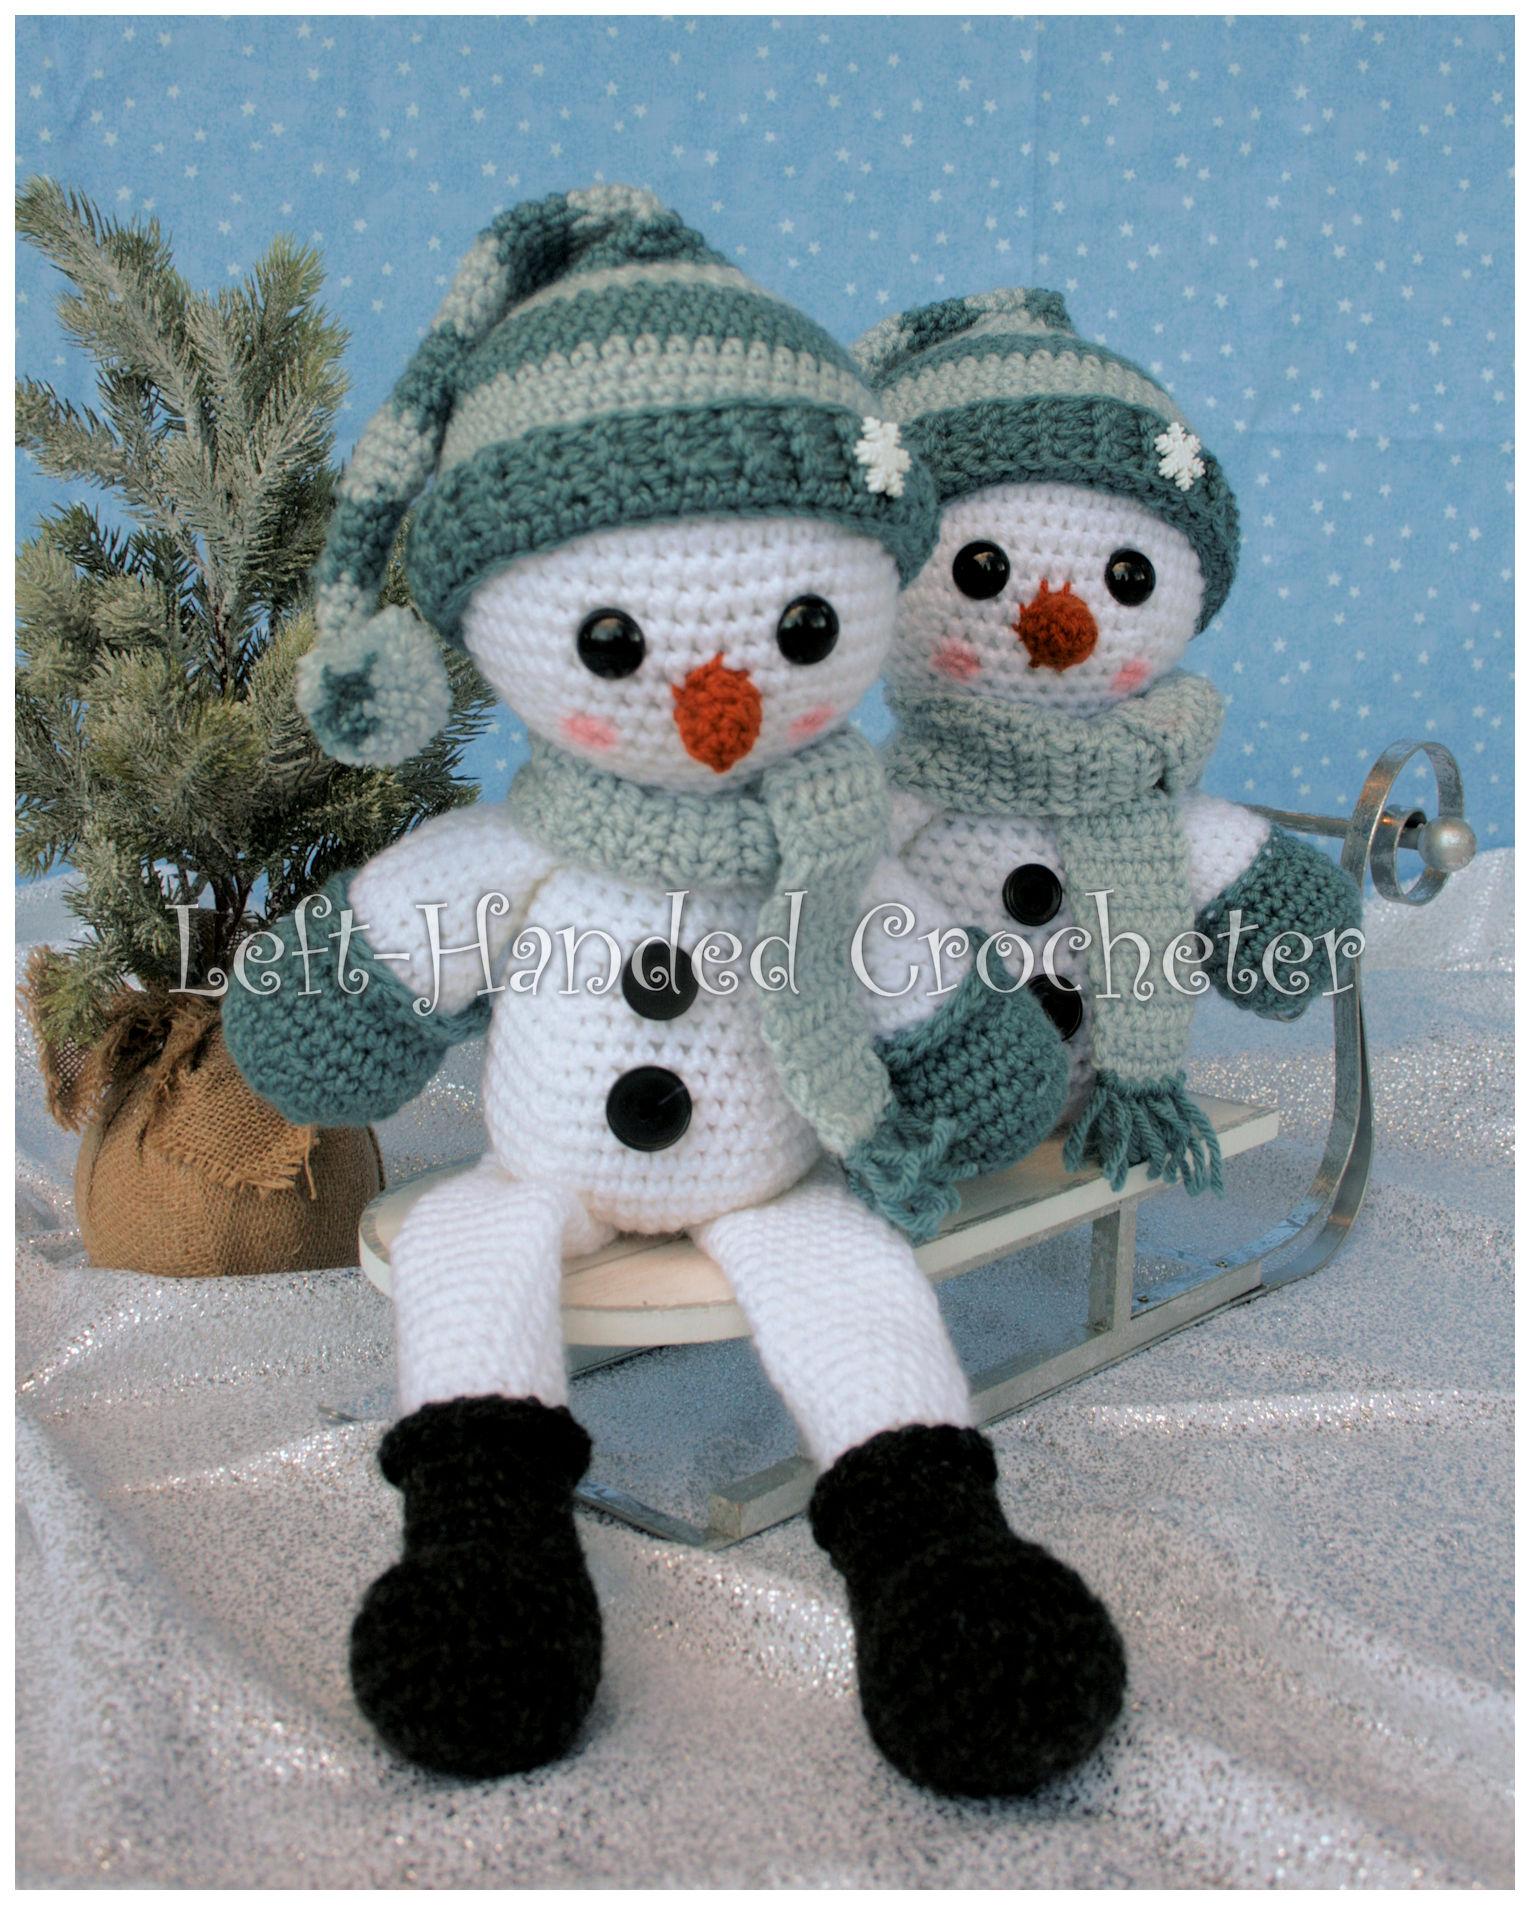 Snowman Draft Stopper And Shelf Sitter